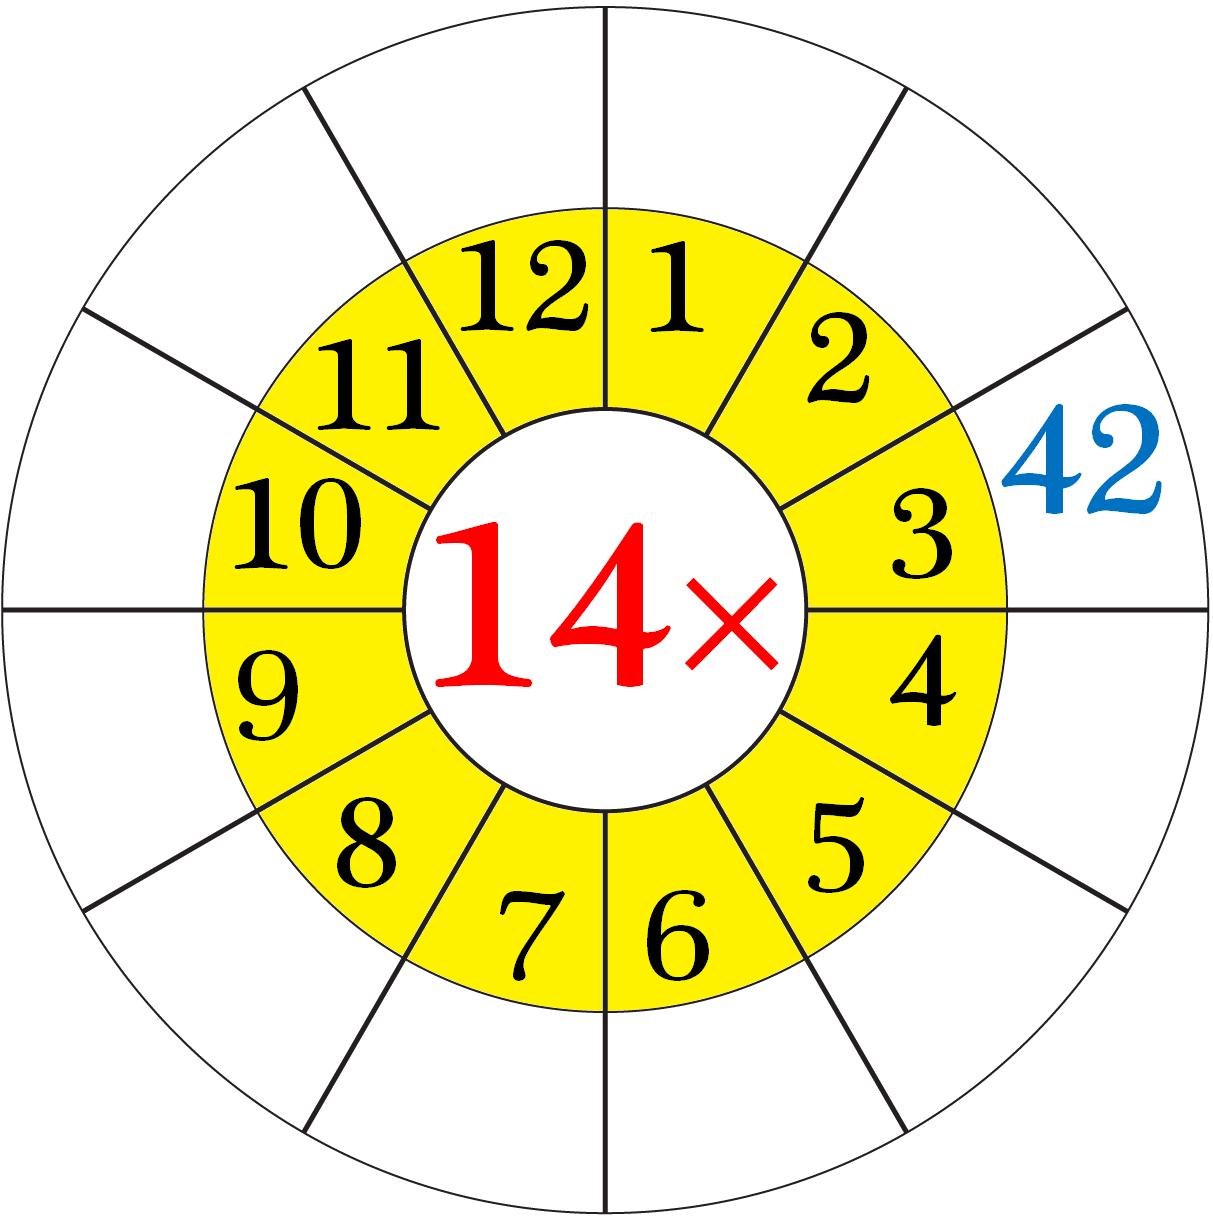 Worksheet On Multiplication Table Of 14